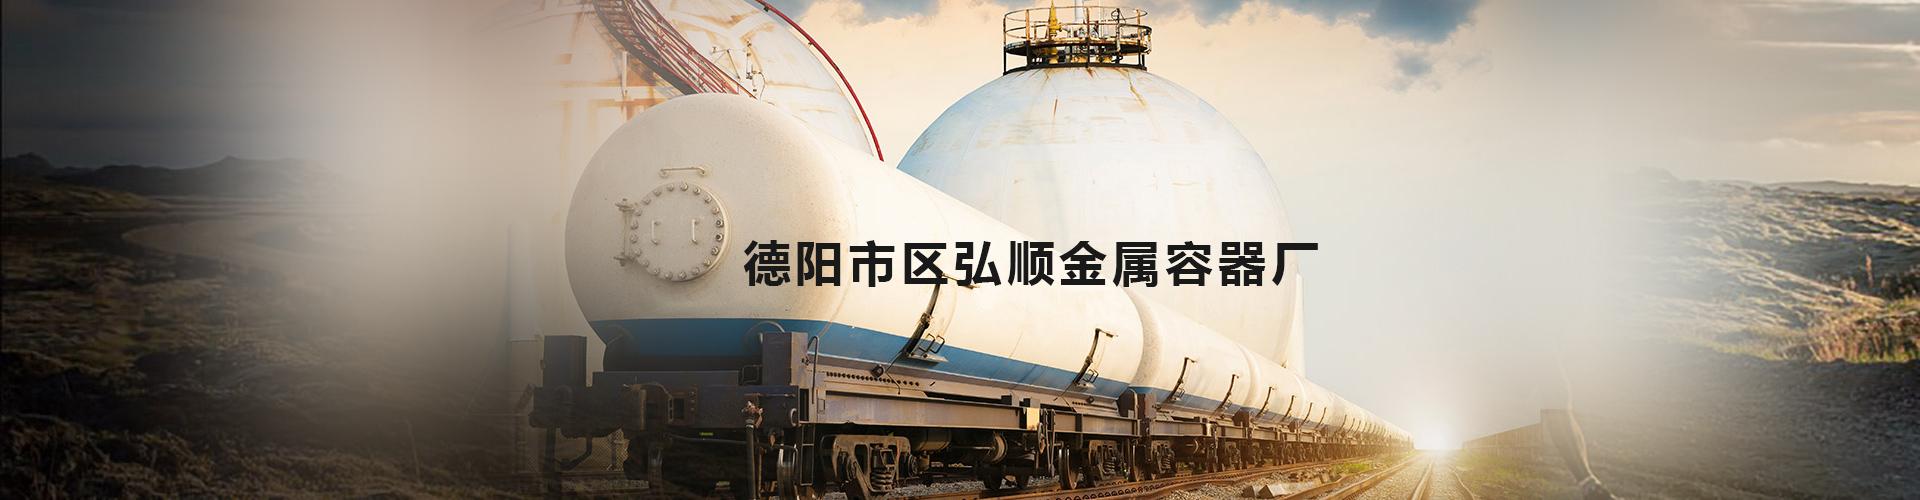 betway88必威入口区弘顺金属容器厂